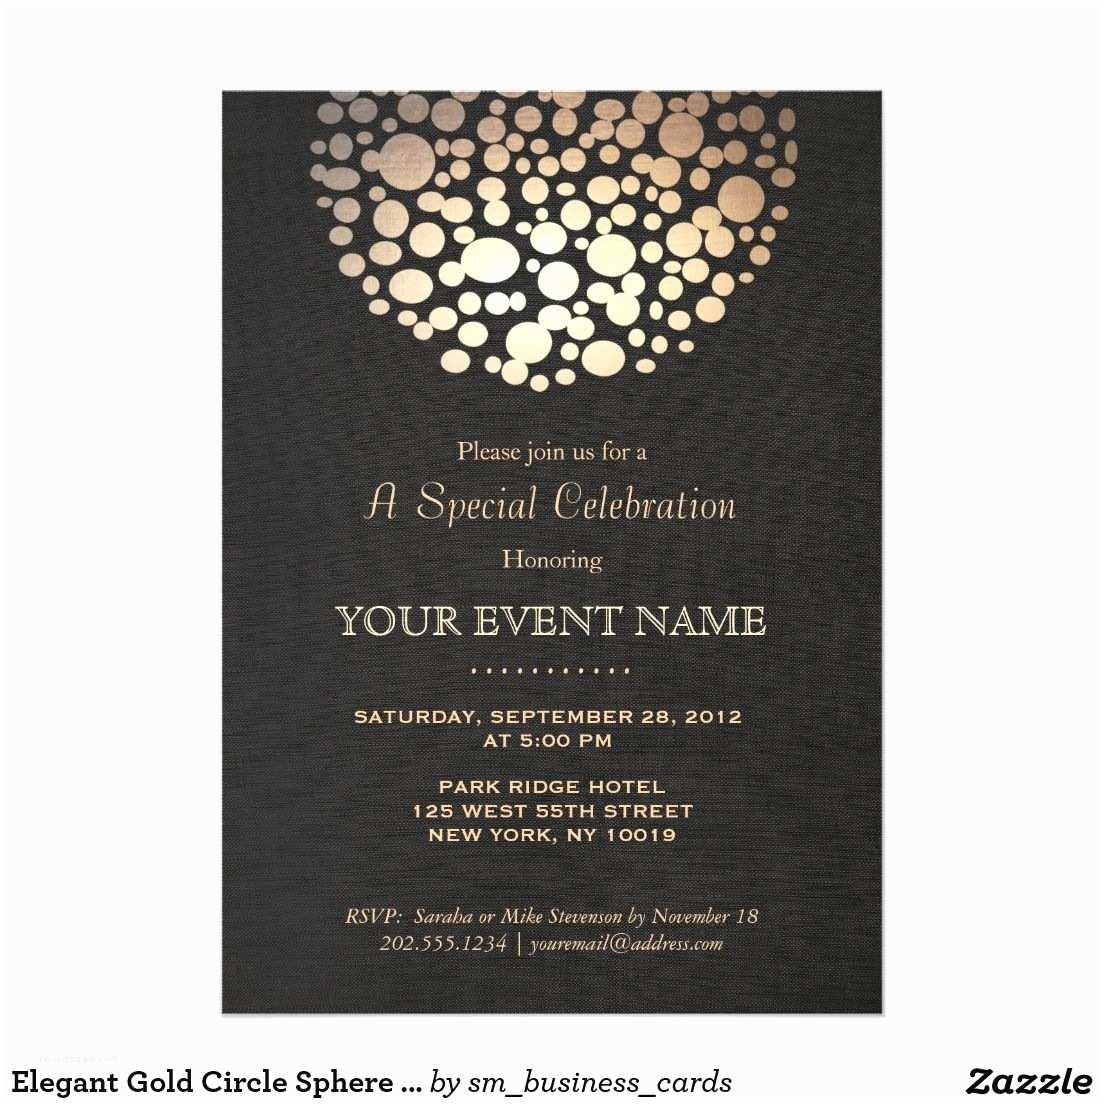 Elegant Party Invitations Elegant Gold Circle Sphere Black formal Invitation